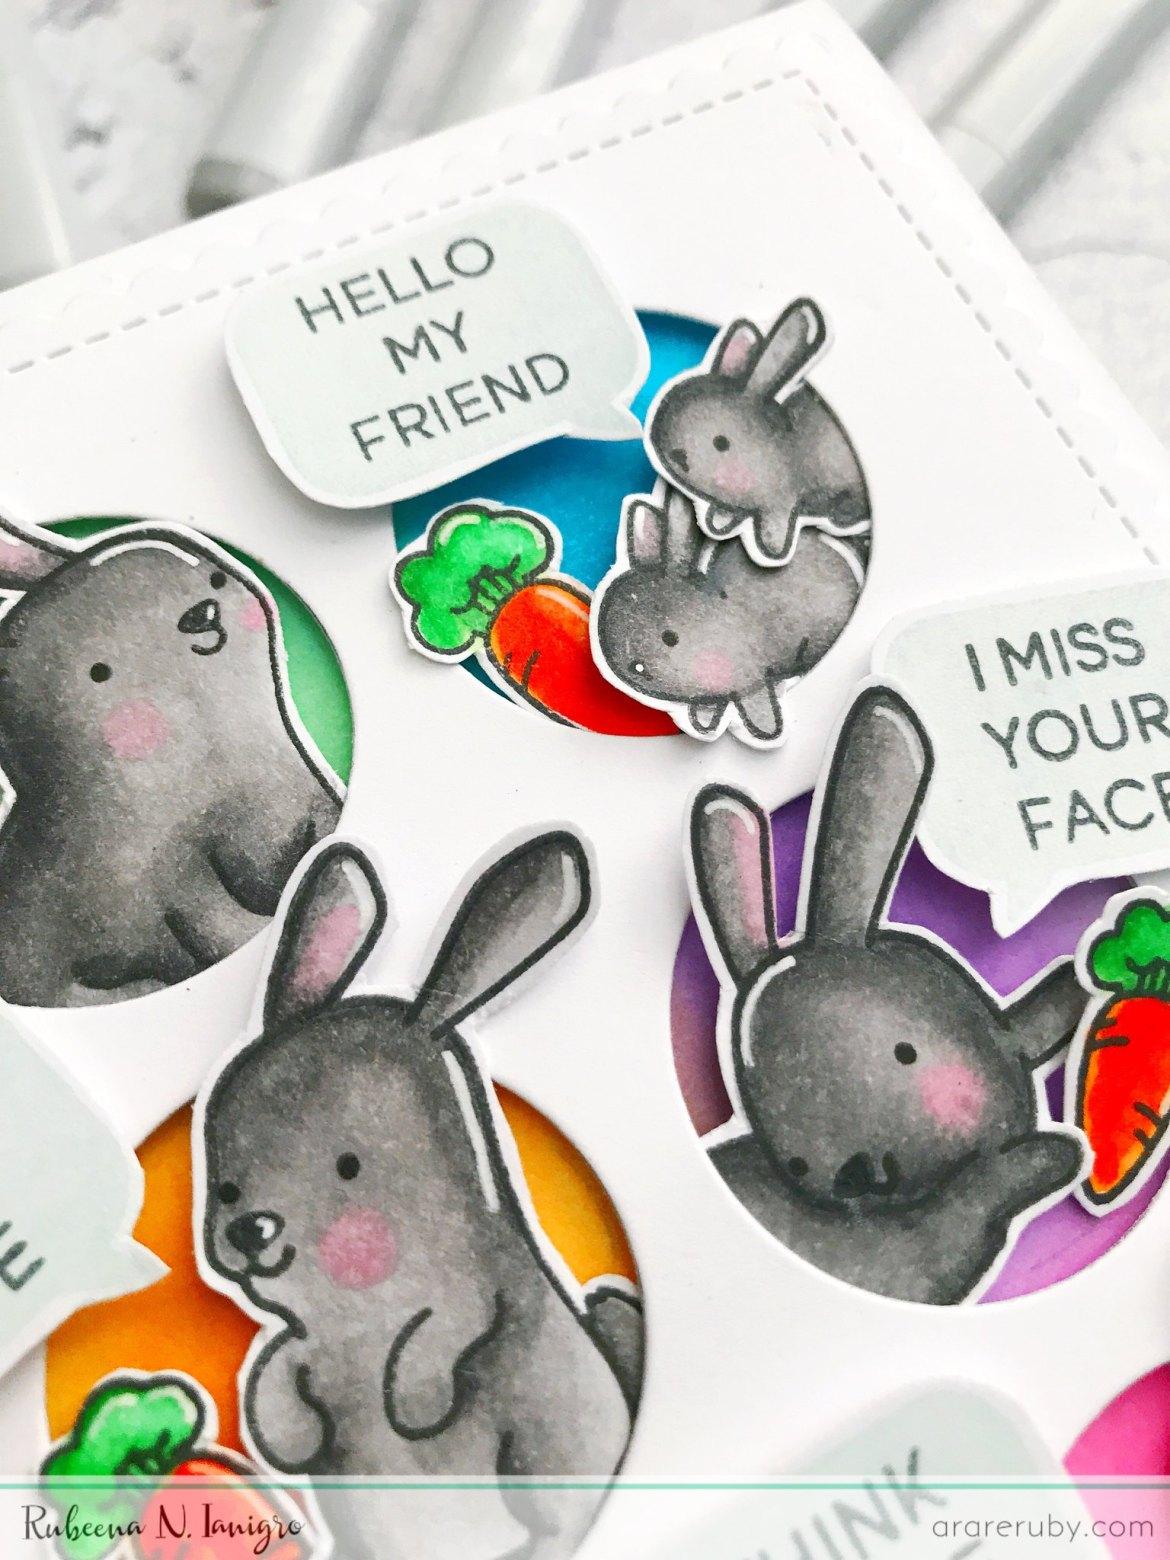 Heffy Doodle Stamps